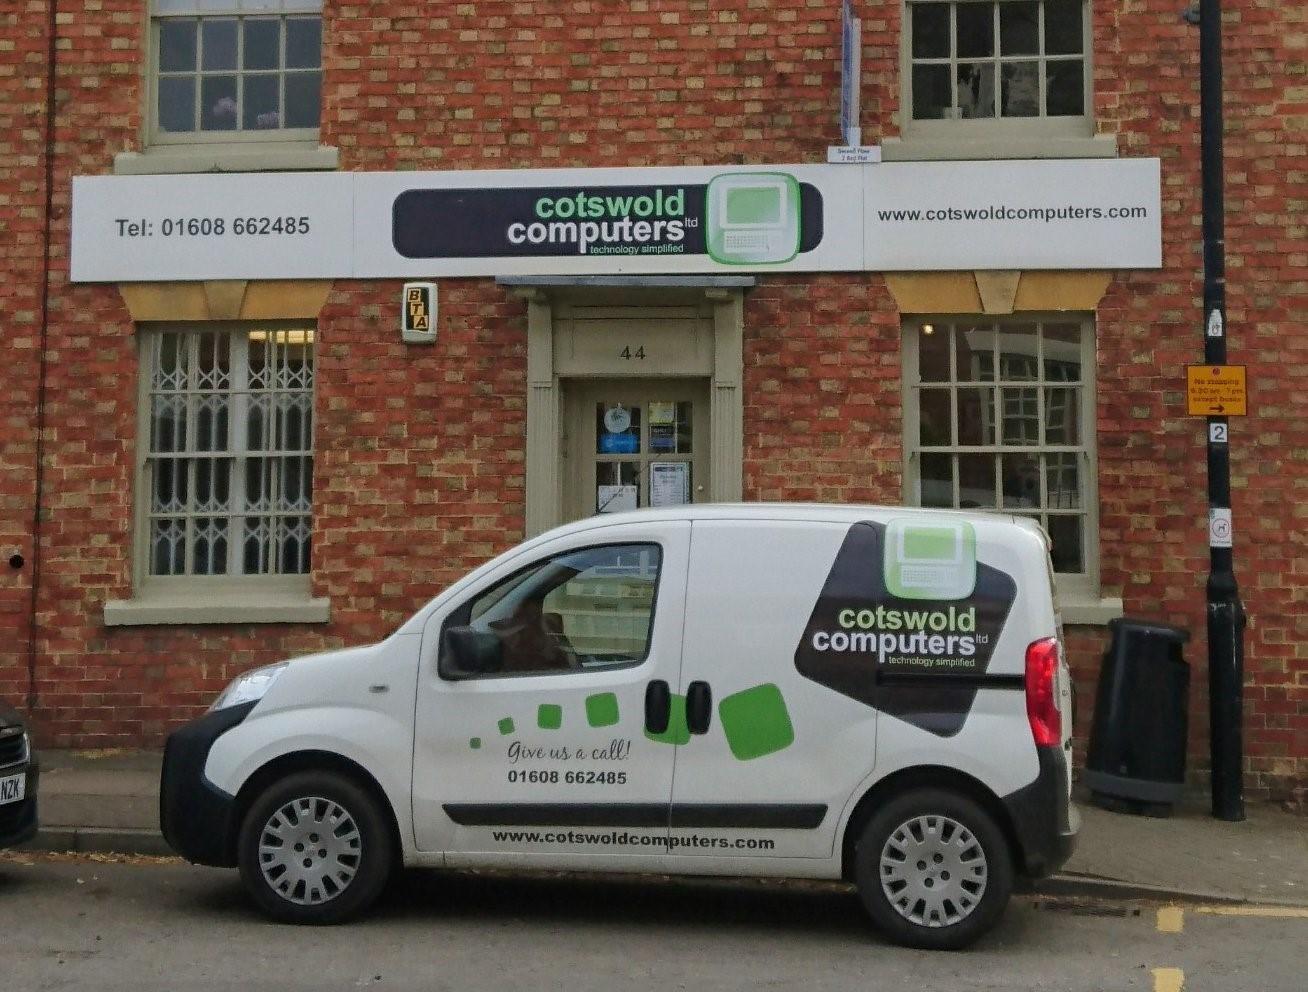 Cotswold Computers Ltd, Shipston on Stour